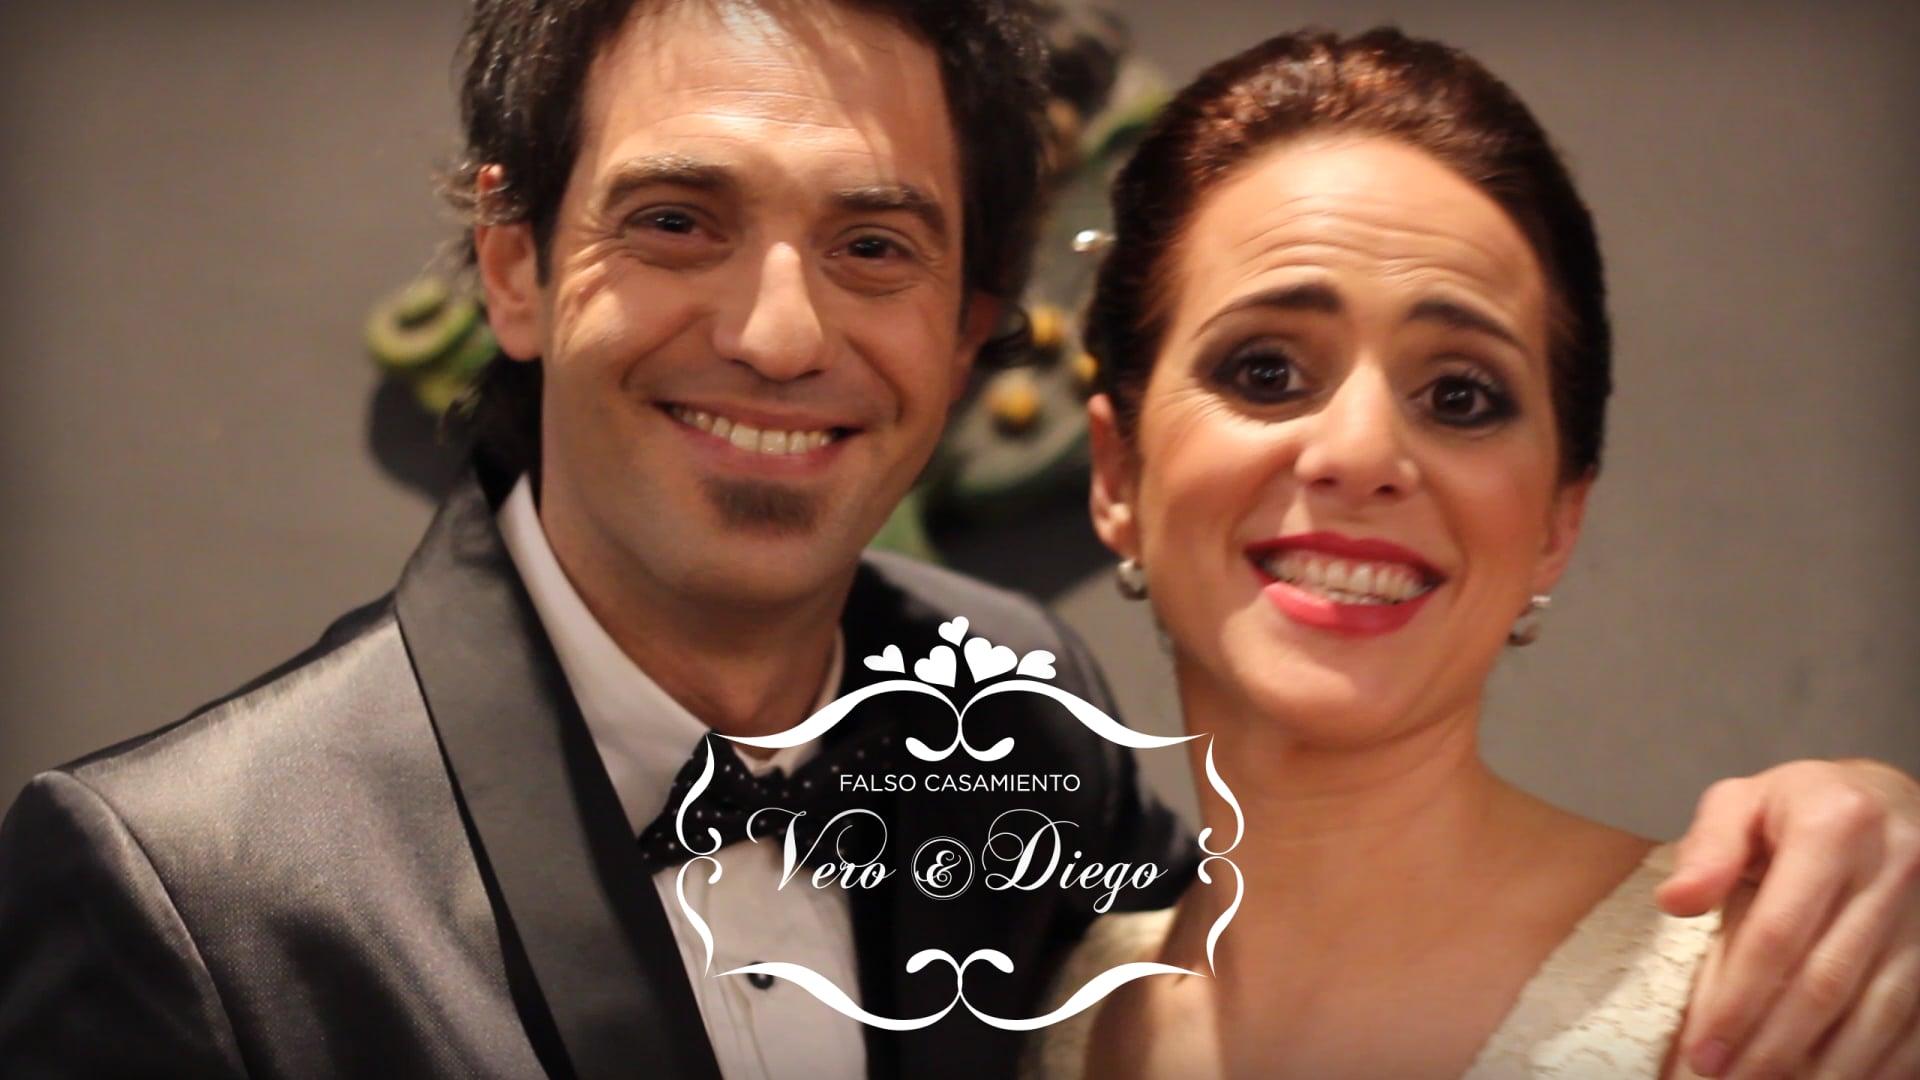 Vero Piñeyrúa & Diego Waisrub   Falso Casamiento 2016  (Trailer)